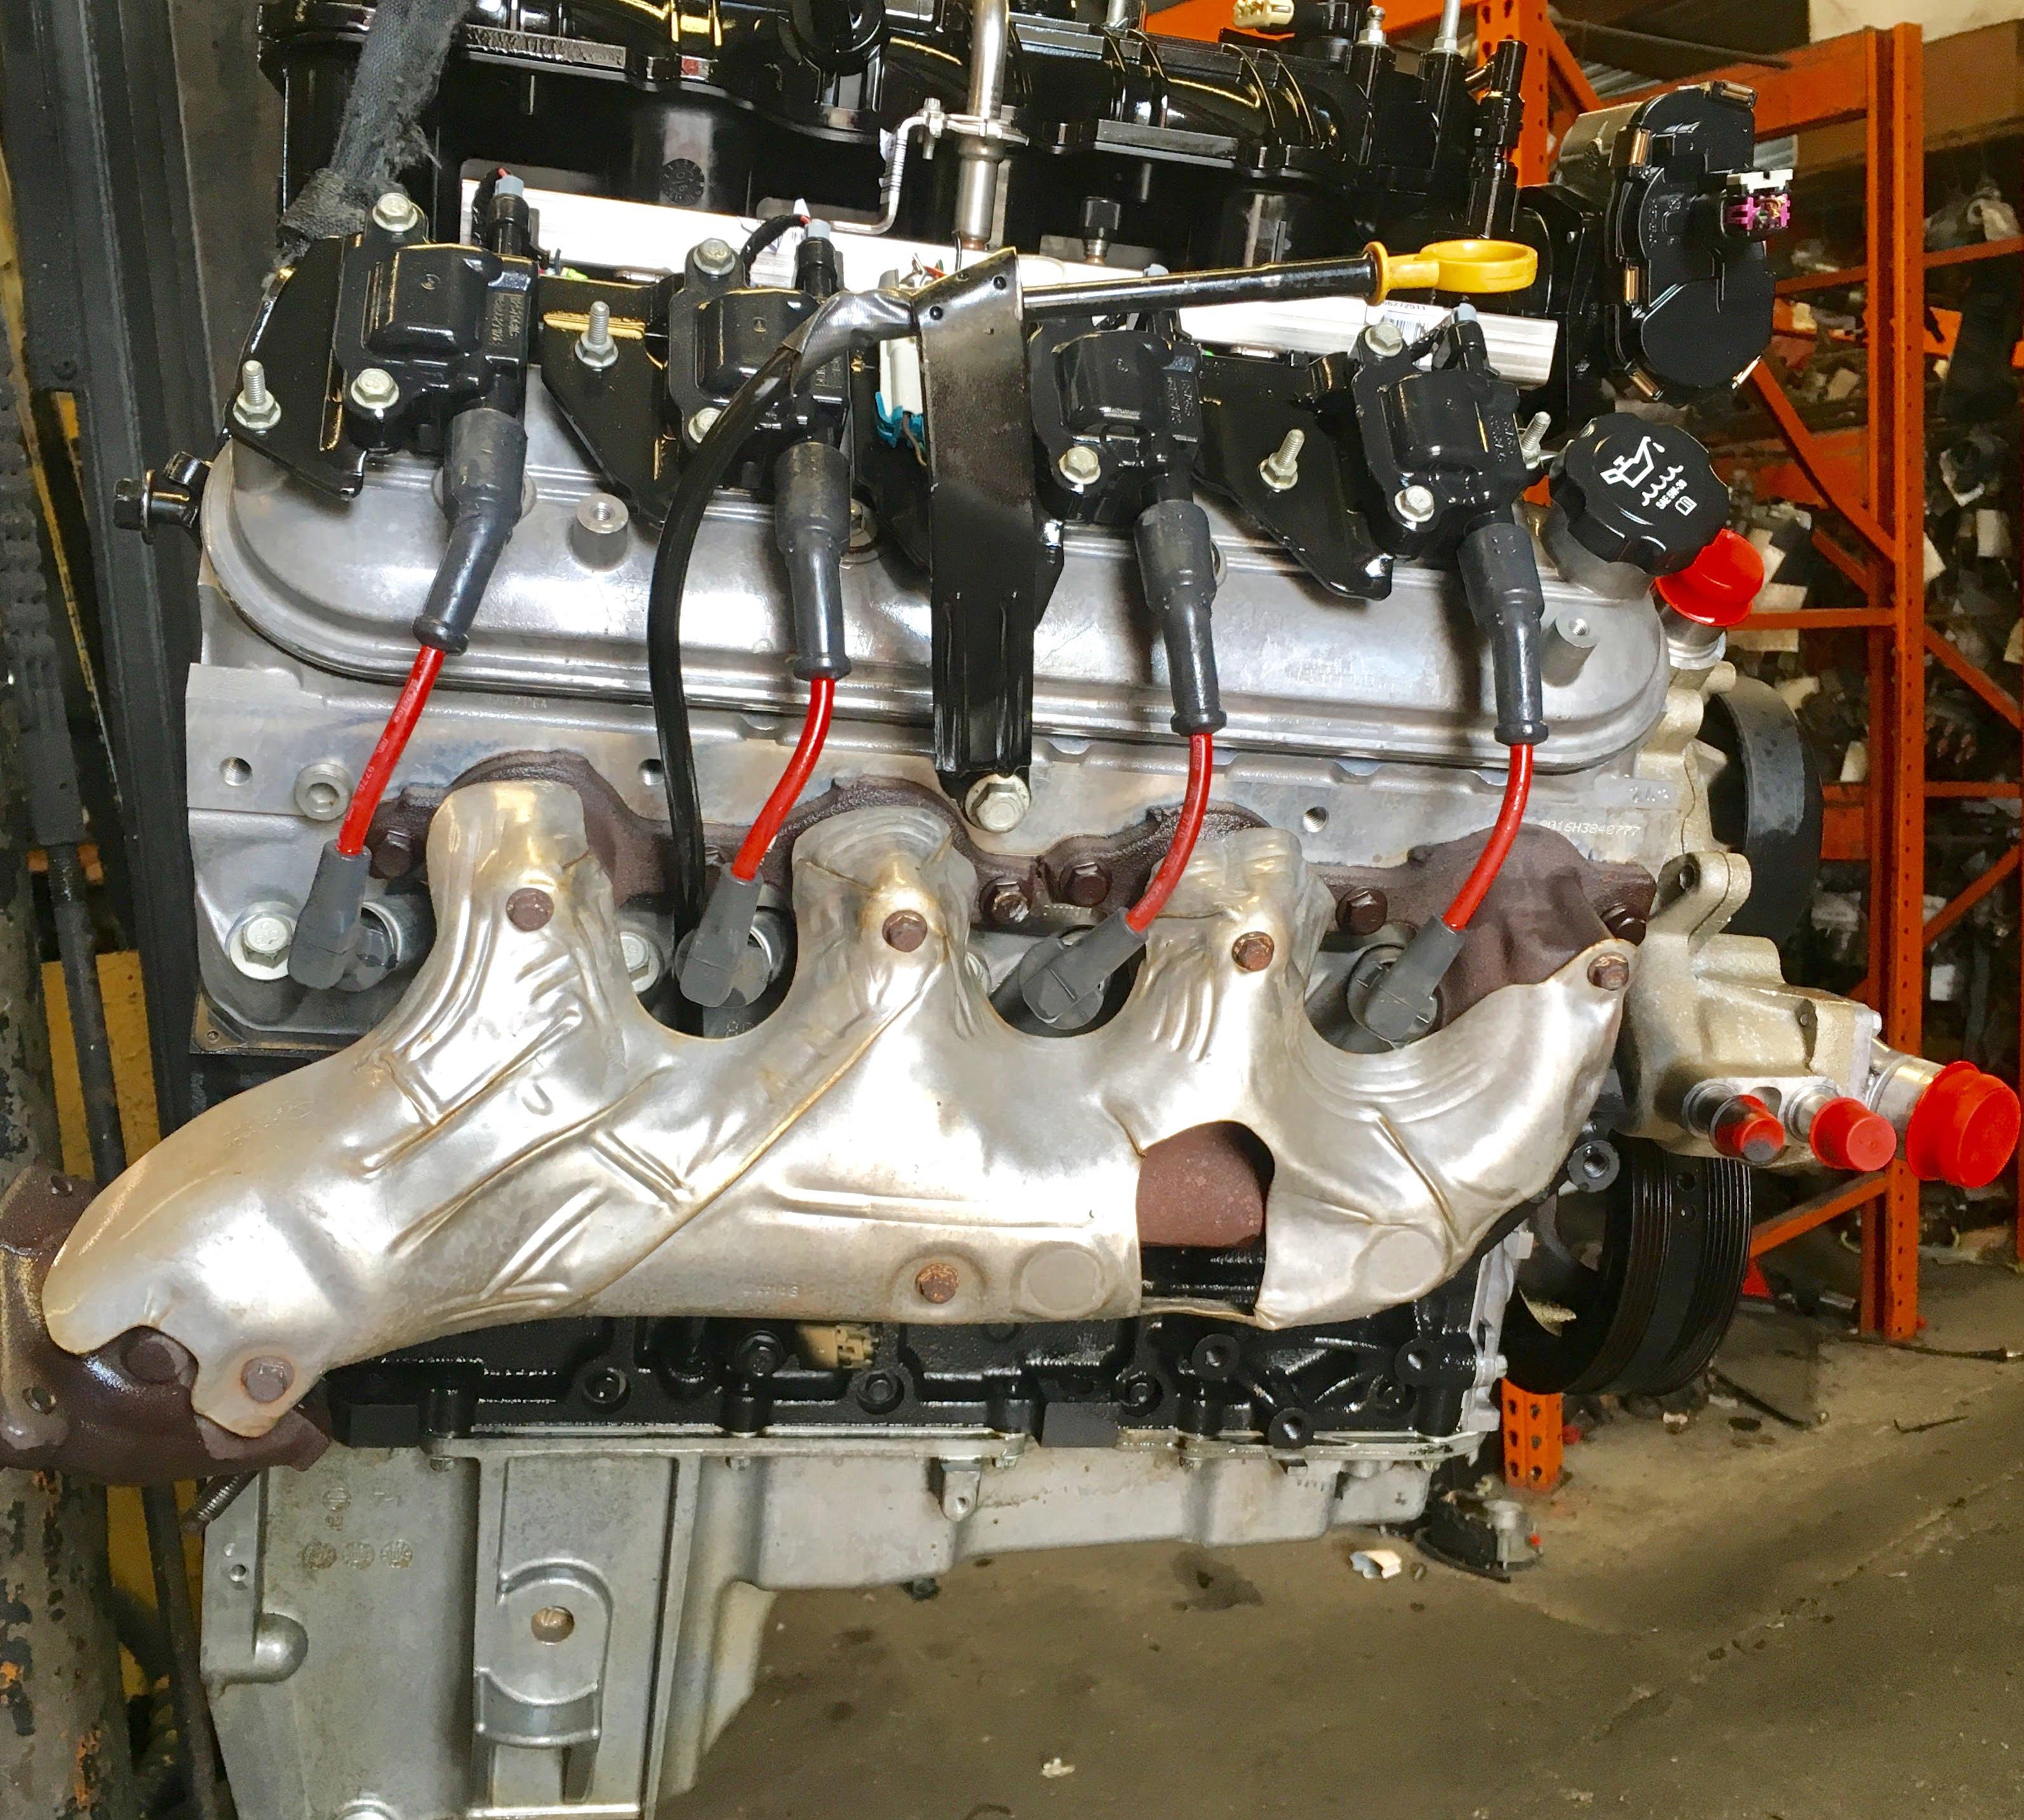 2008 Tahoe Fuel Filter Location Trailblazer Envoy Ascender Rainier 9 7x 5 3l Engine 2006